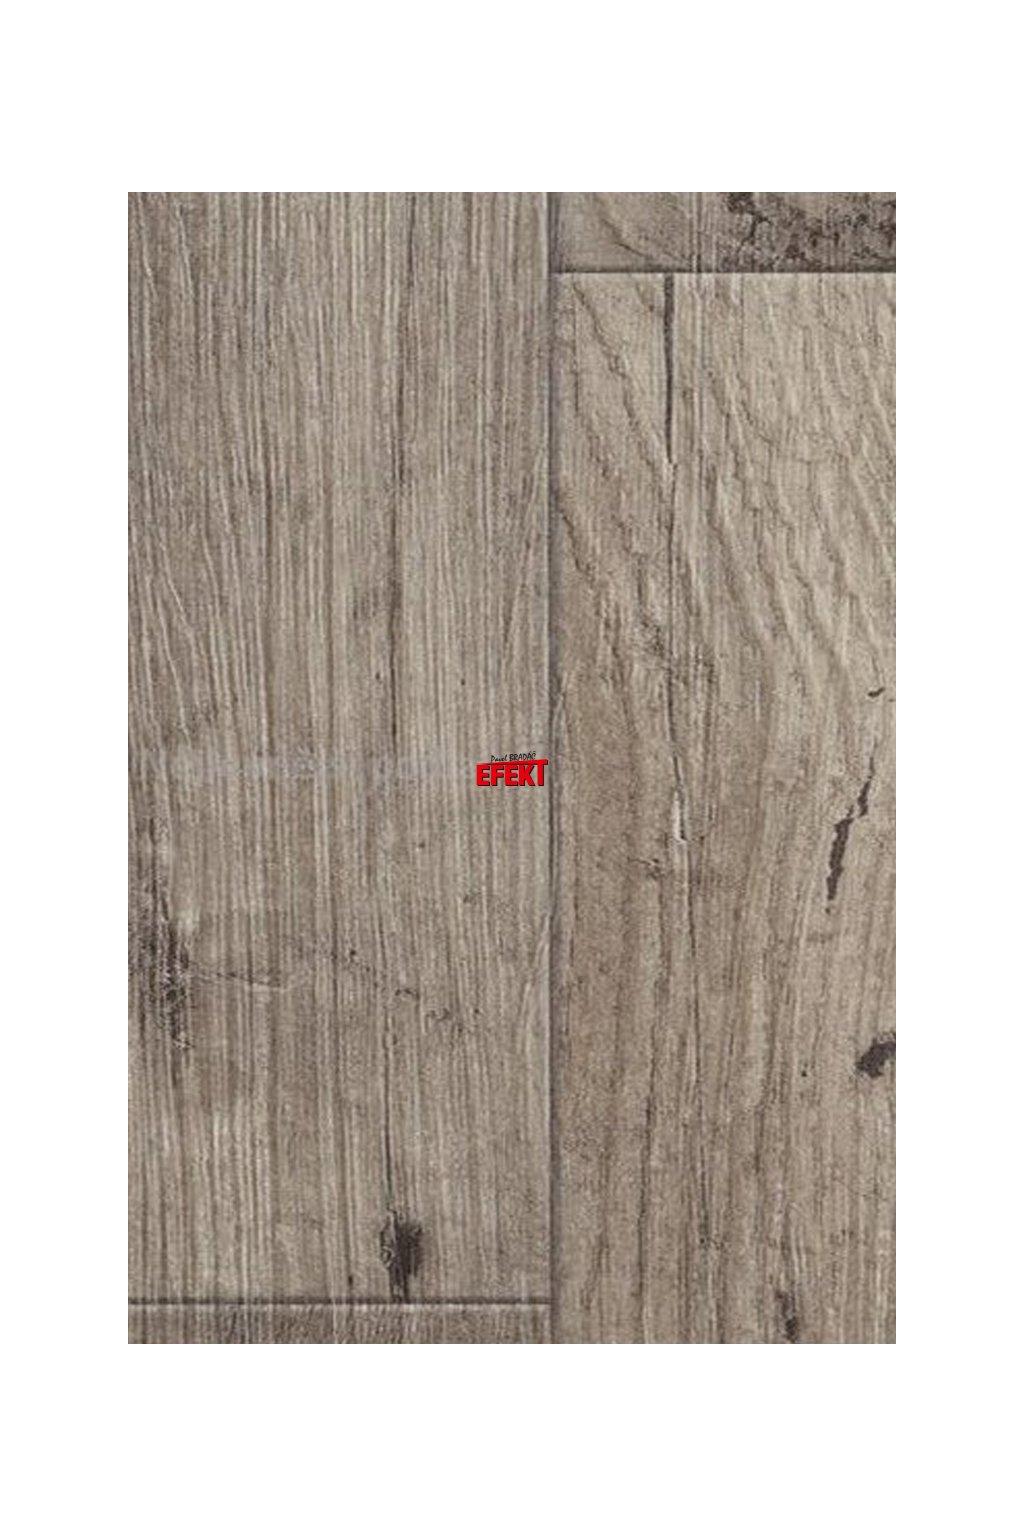 Gerflor Timberline Rustic Pine Warm Grey 0432